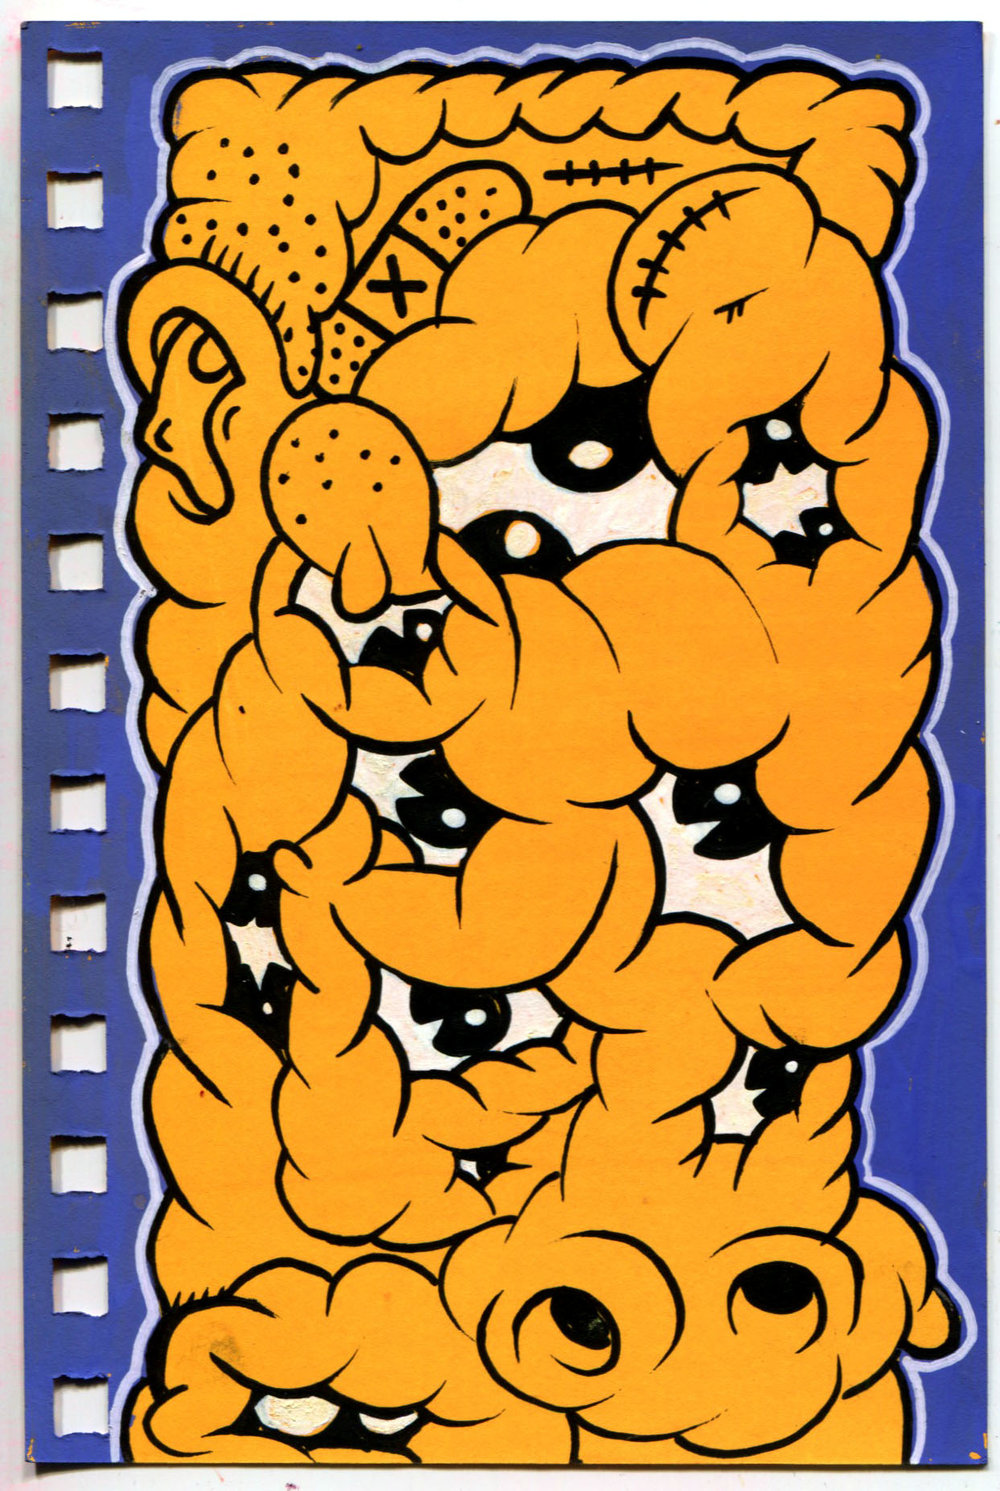 yellowbrick.jpg